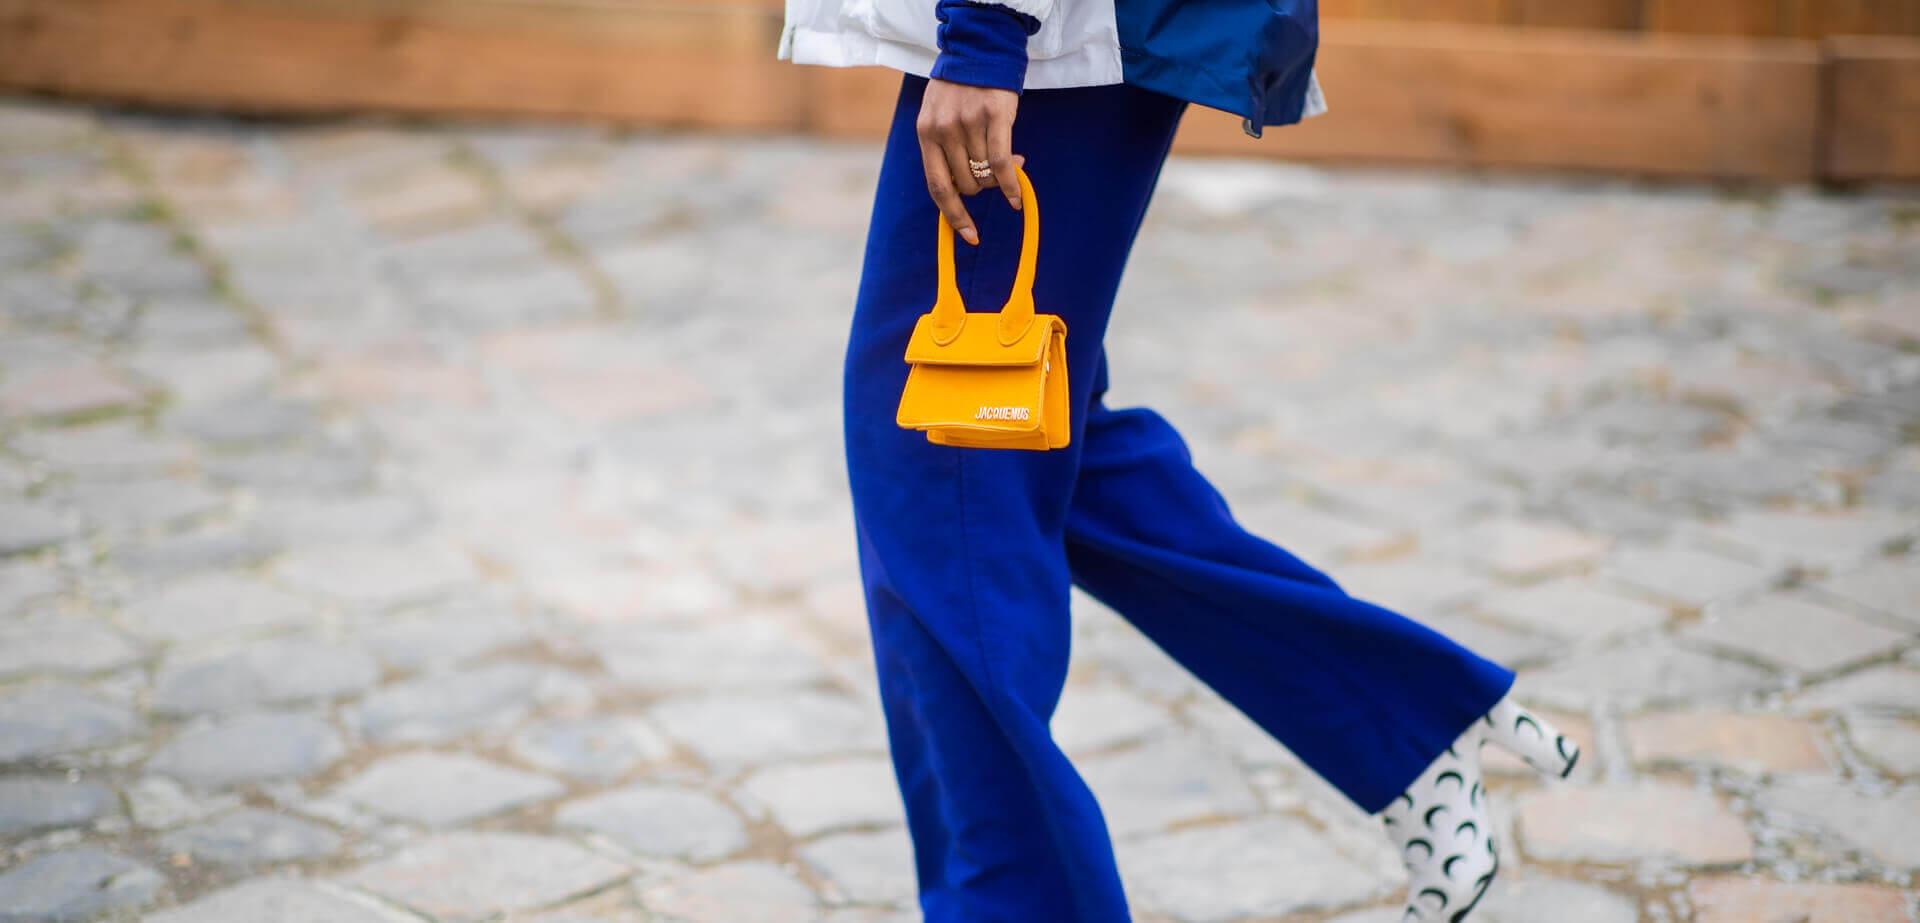 Mini bag - © Christian Vierig/Getty Images